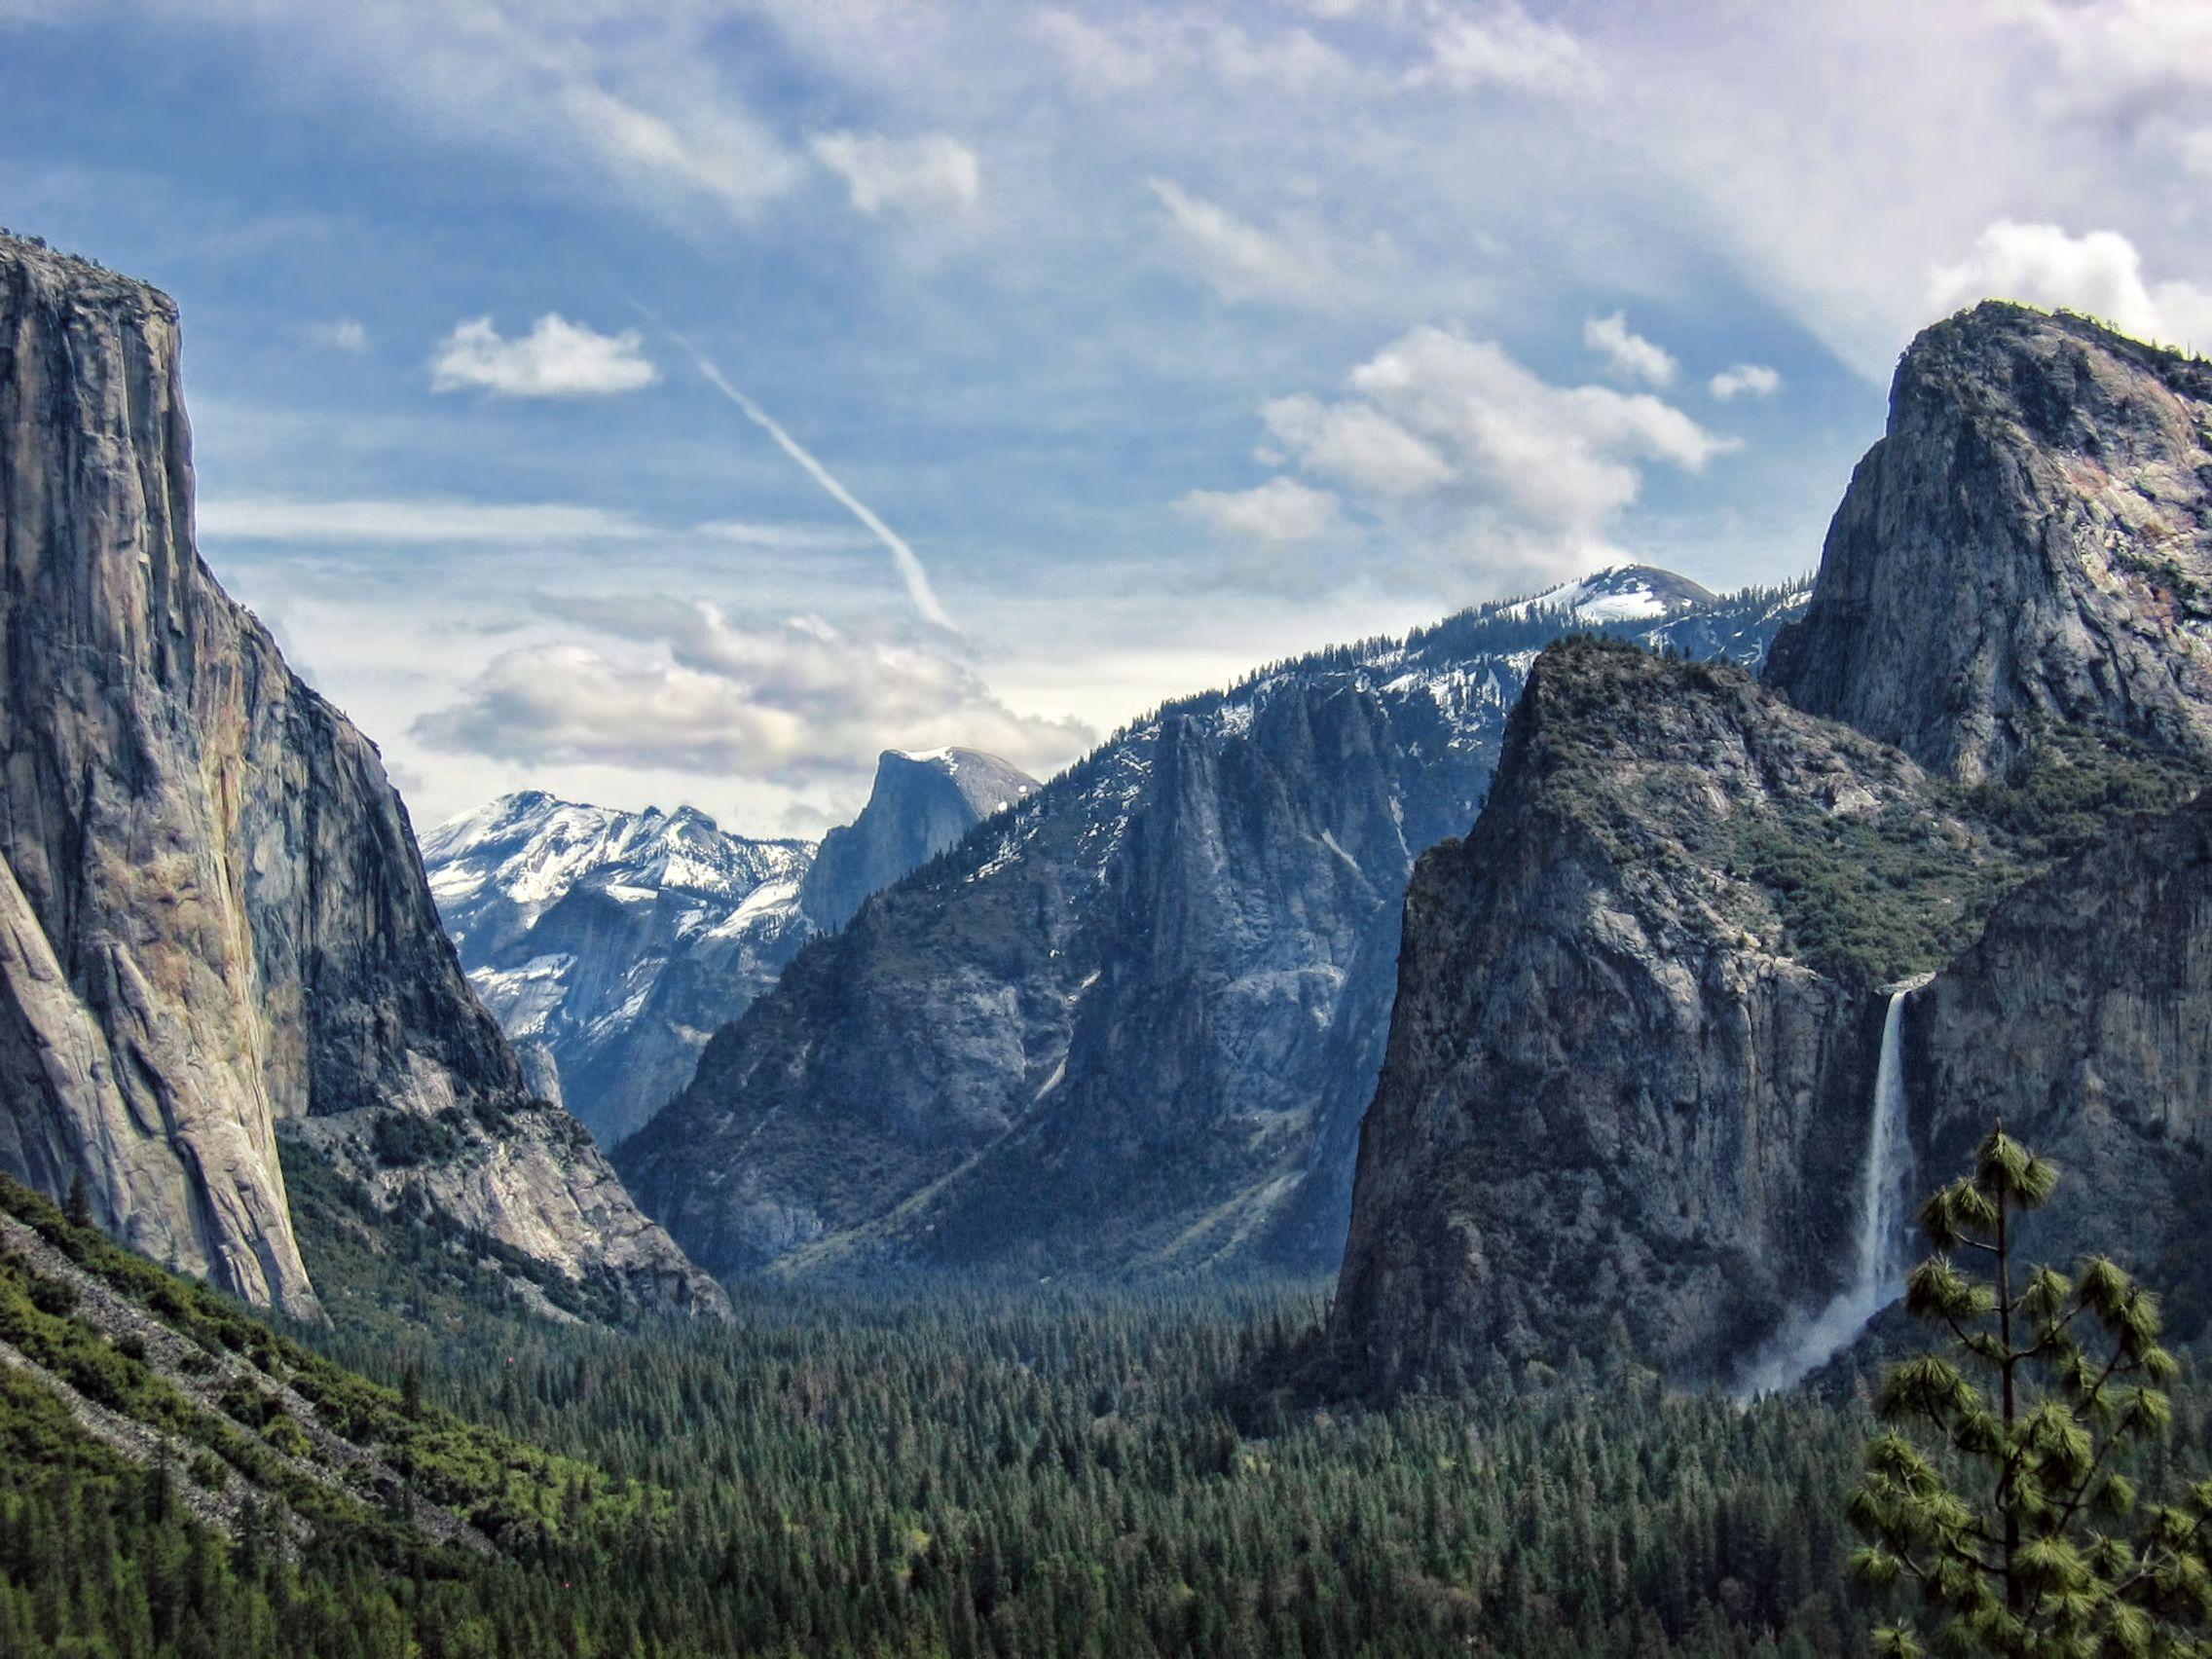 Klettersteig Yosemite : Yosemite valley national park ca target mapping